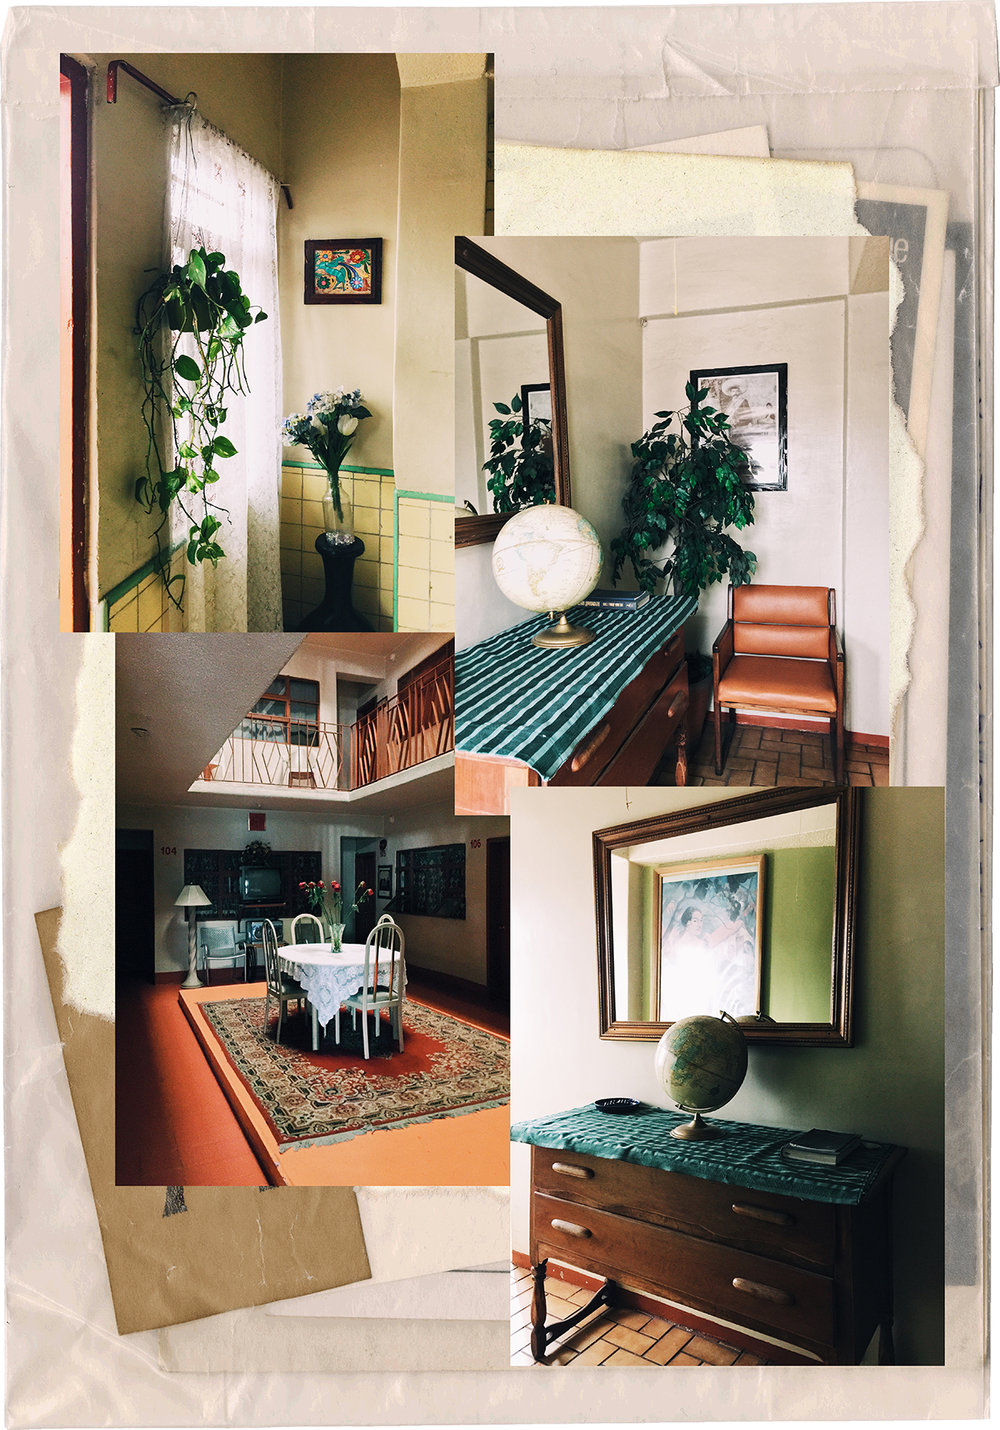 6_hotel.jpg